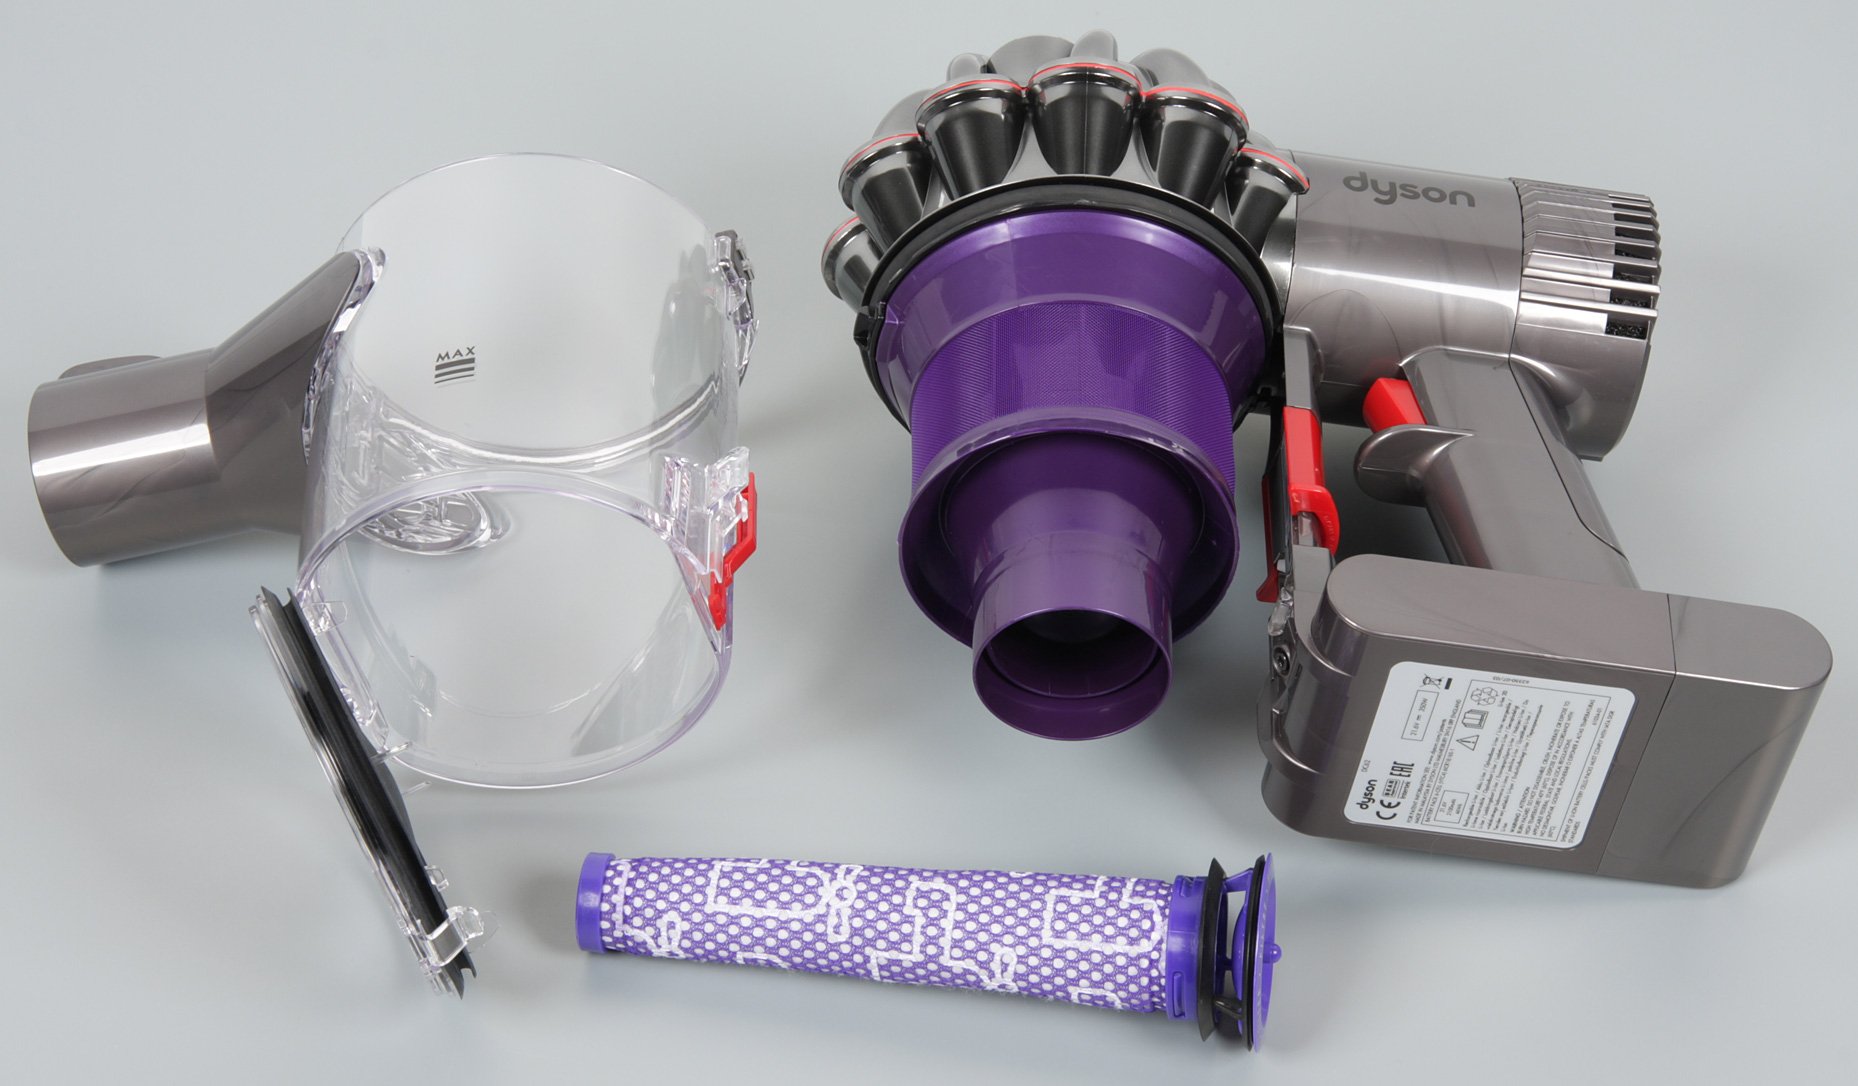 Dyson dc62 как почистить dyson tools how to use